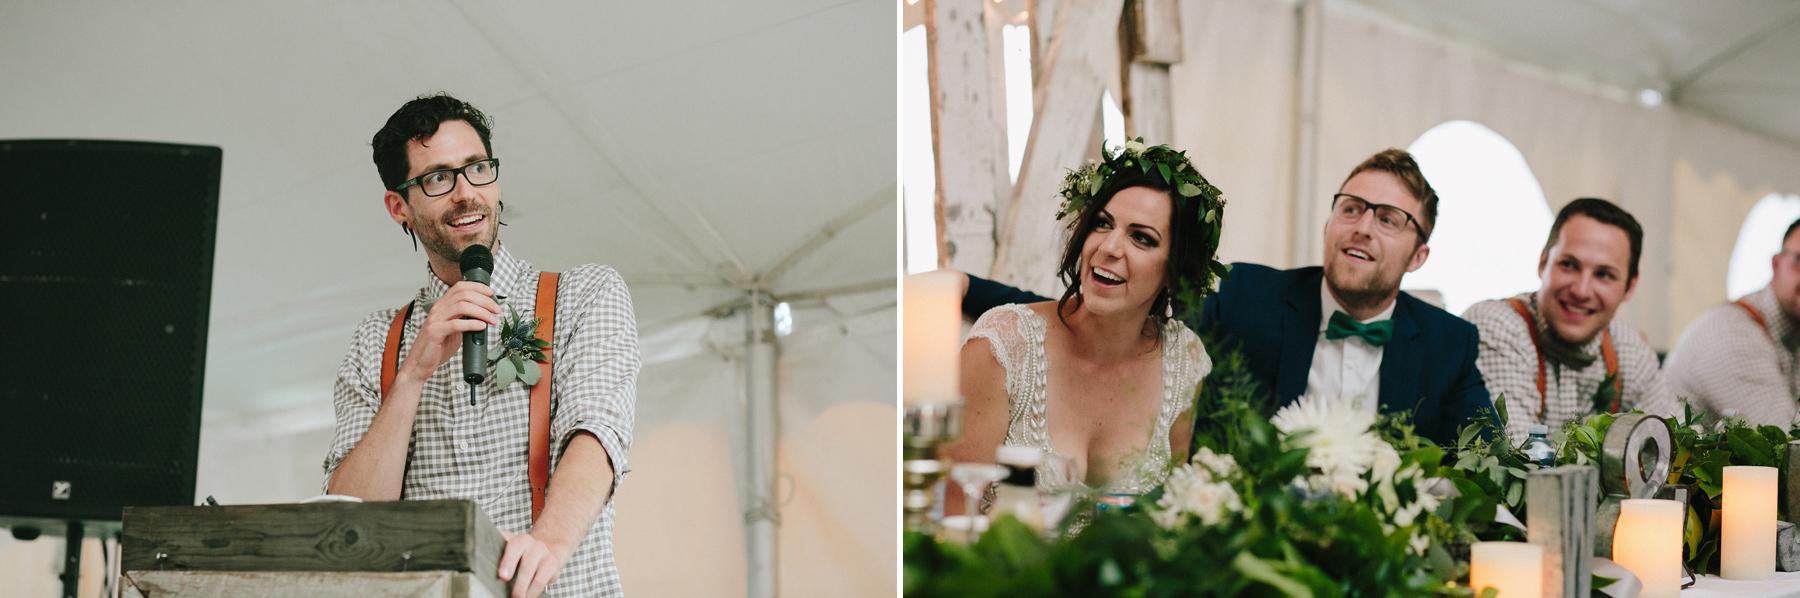 alberta-farm-wedding-photographer-rp-wj-216.jpg